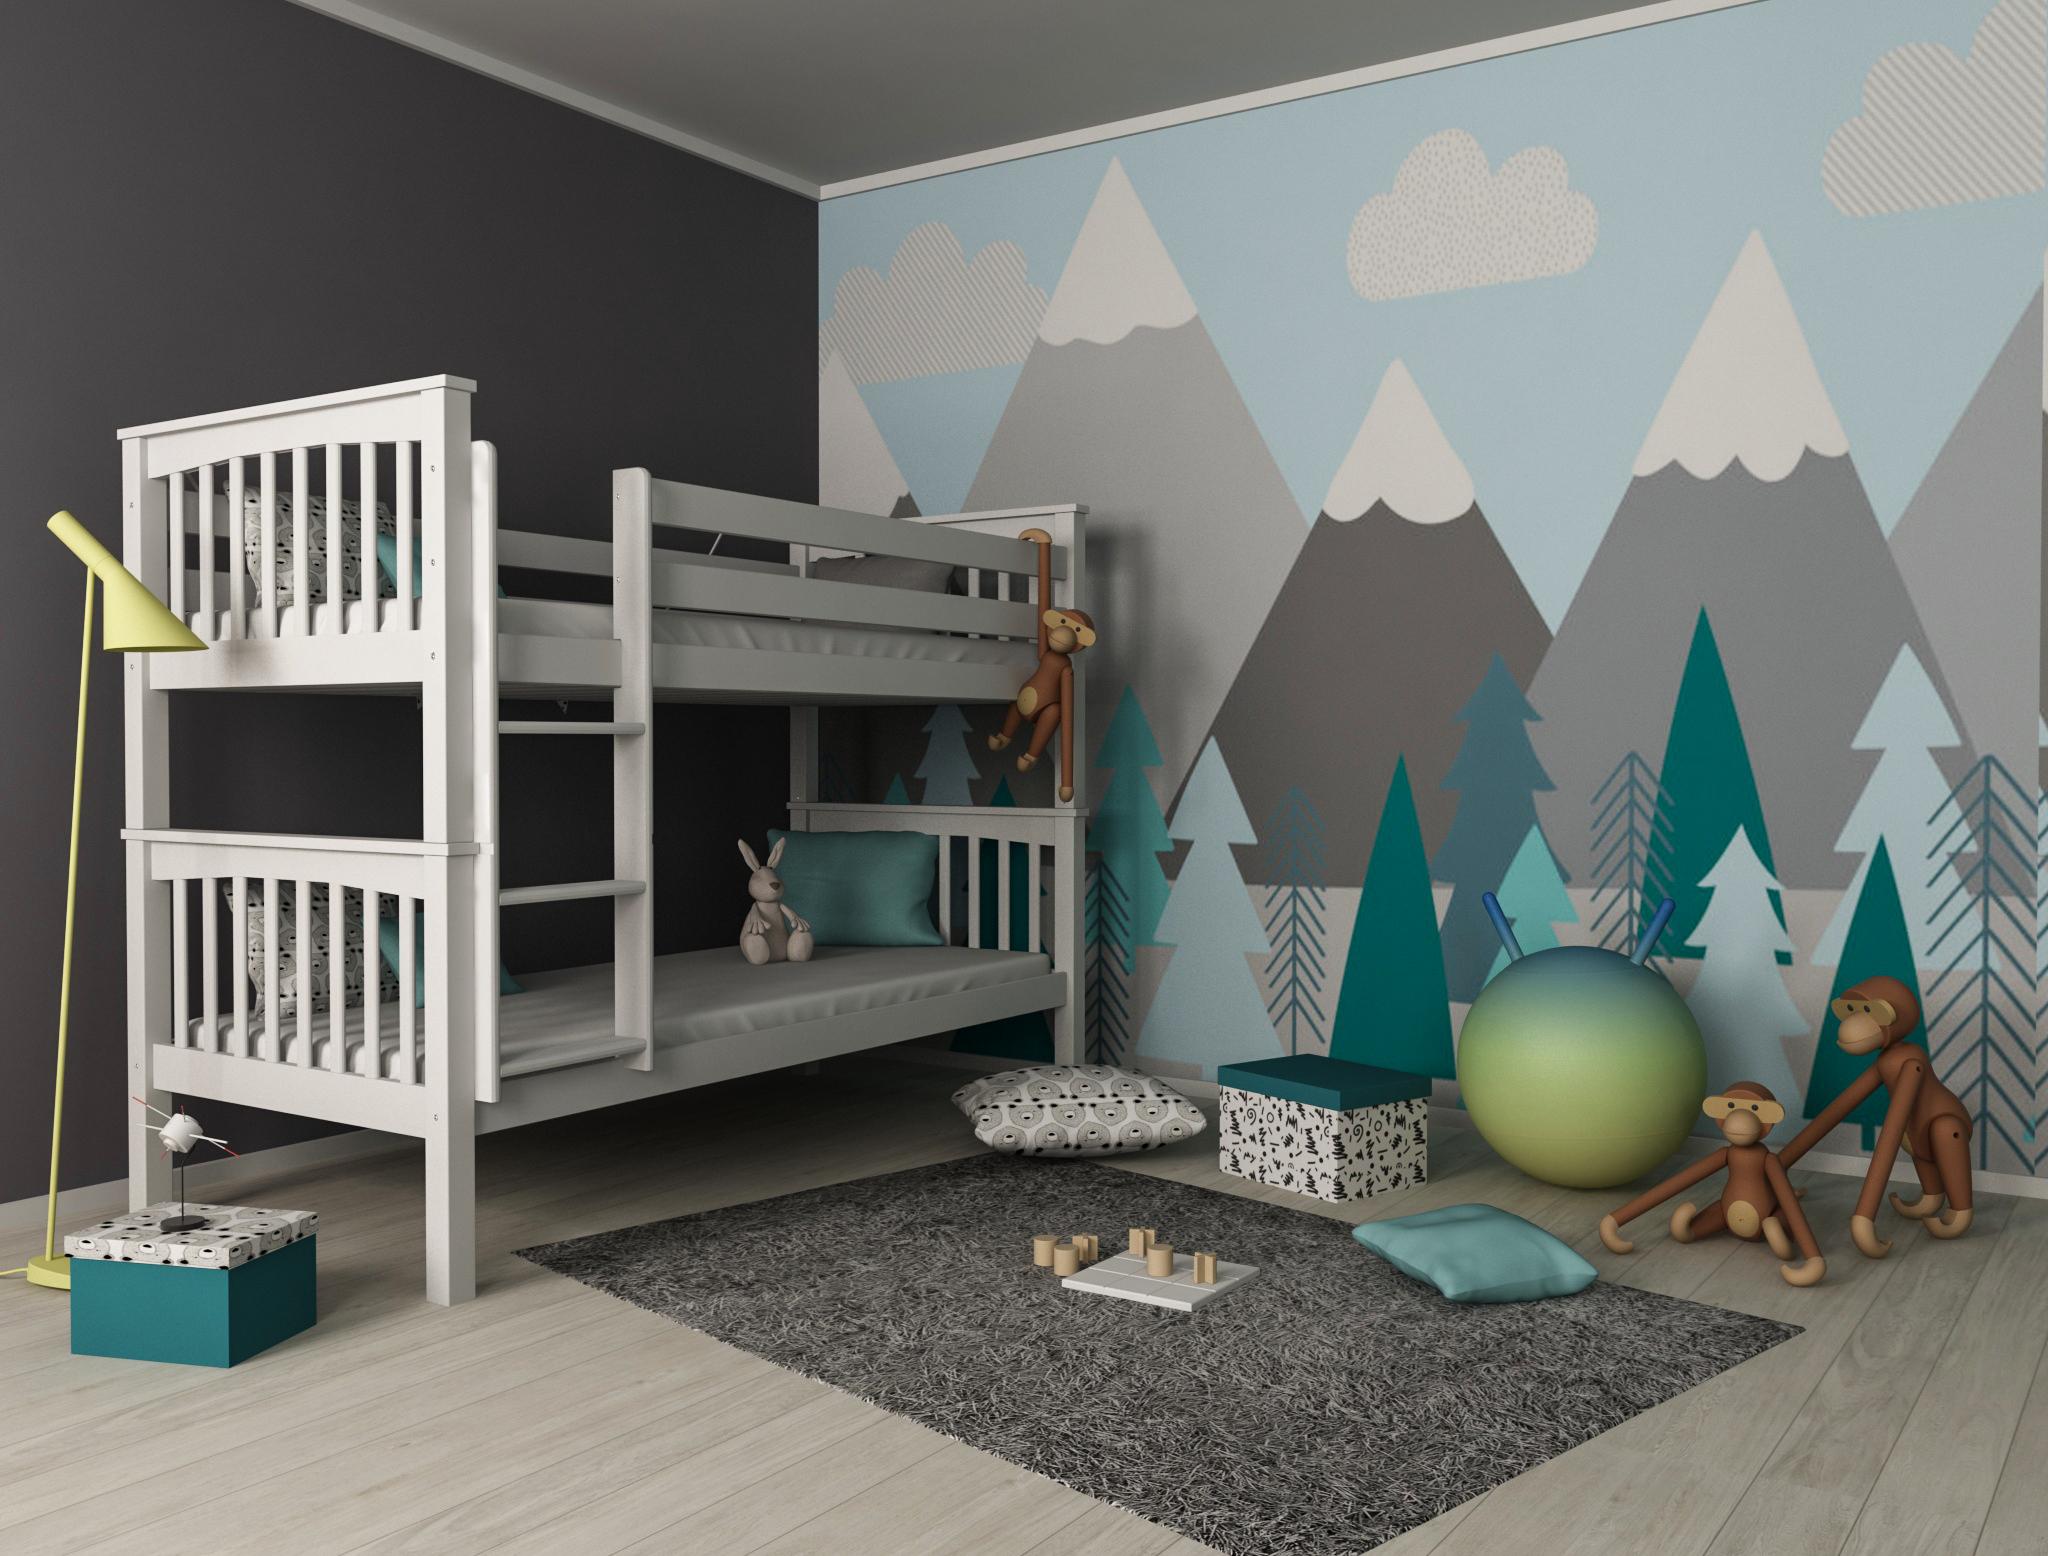 Full Size of Hochbett Kinderzimmer Regal Weiß Sofa Regale Kinderzimmer Hochbett Kinderzimmer